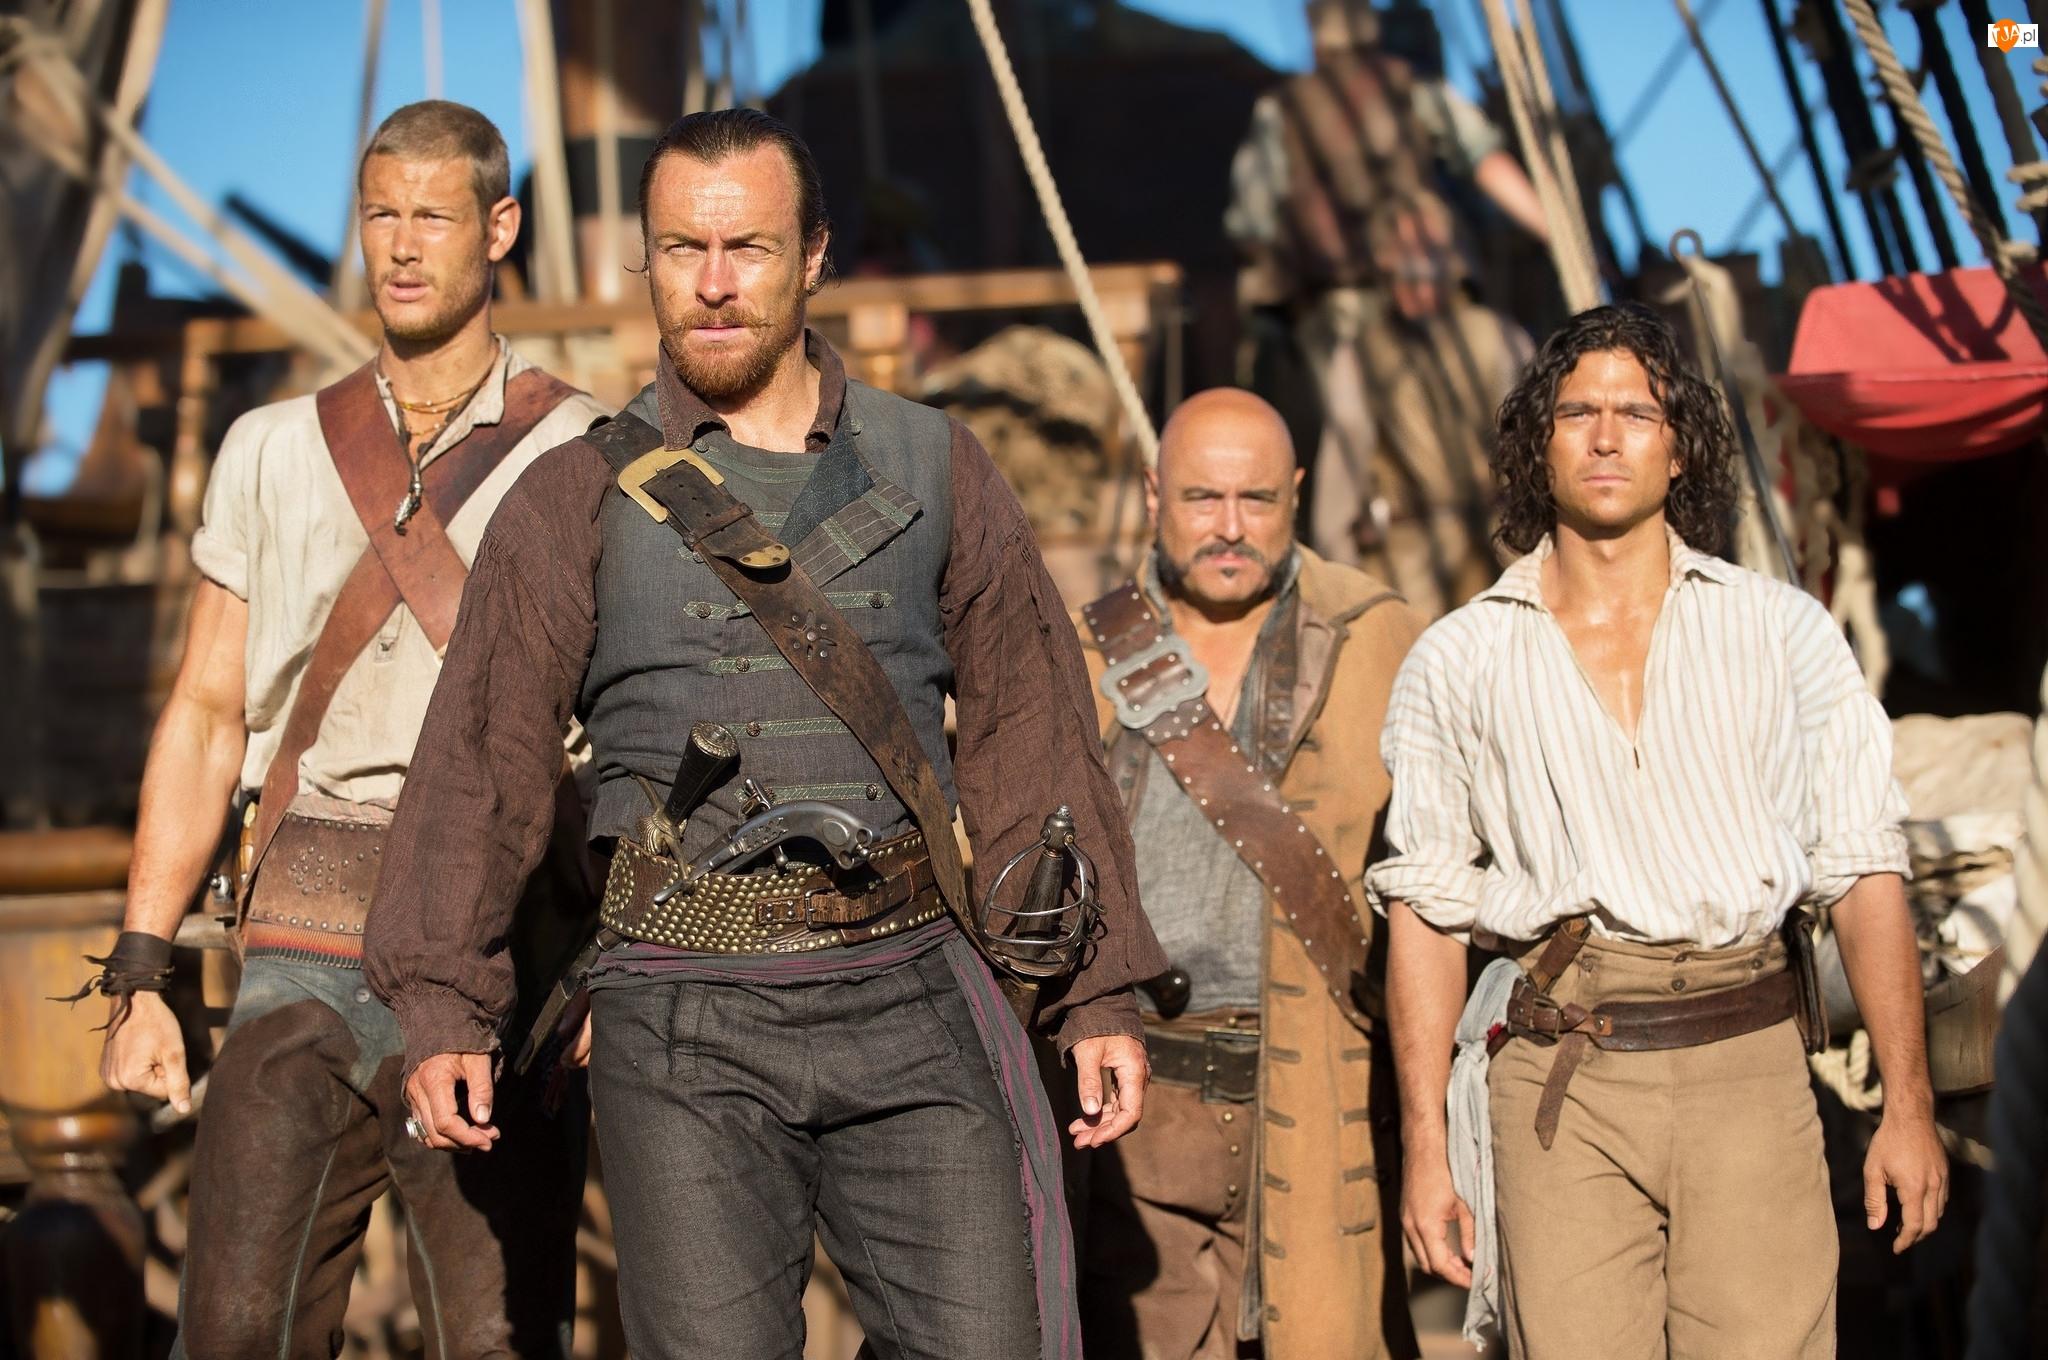 Tom Hopper, Kapitan Flint, Billy Bones, Black Sails, Toby Stephens, Serial, Długi John Silver, Piraci, Luke Arnold